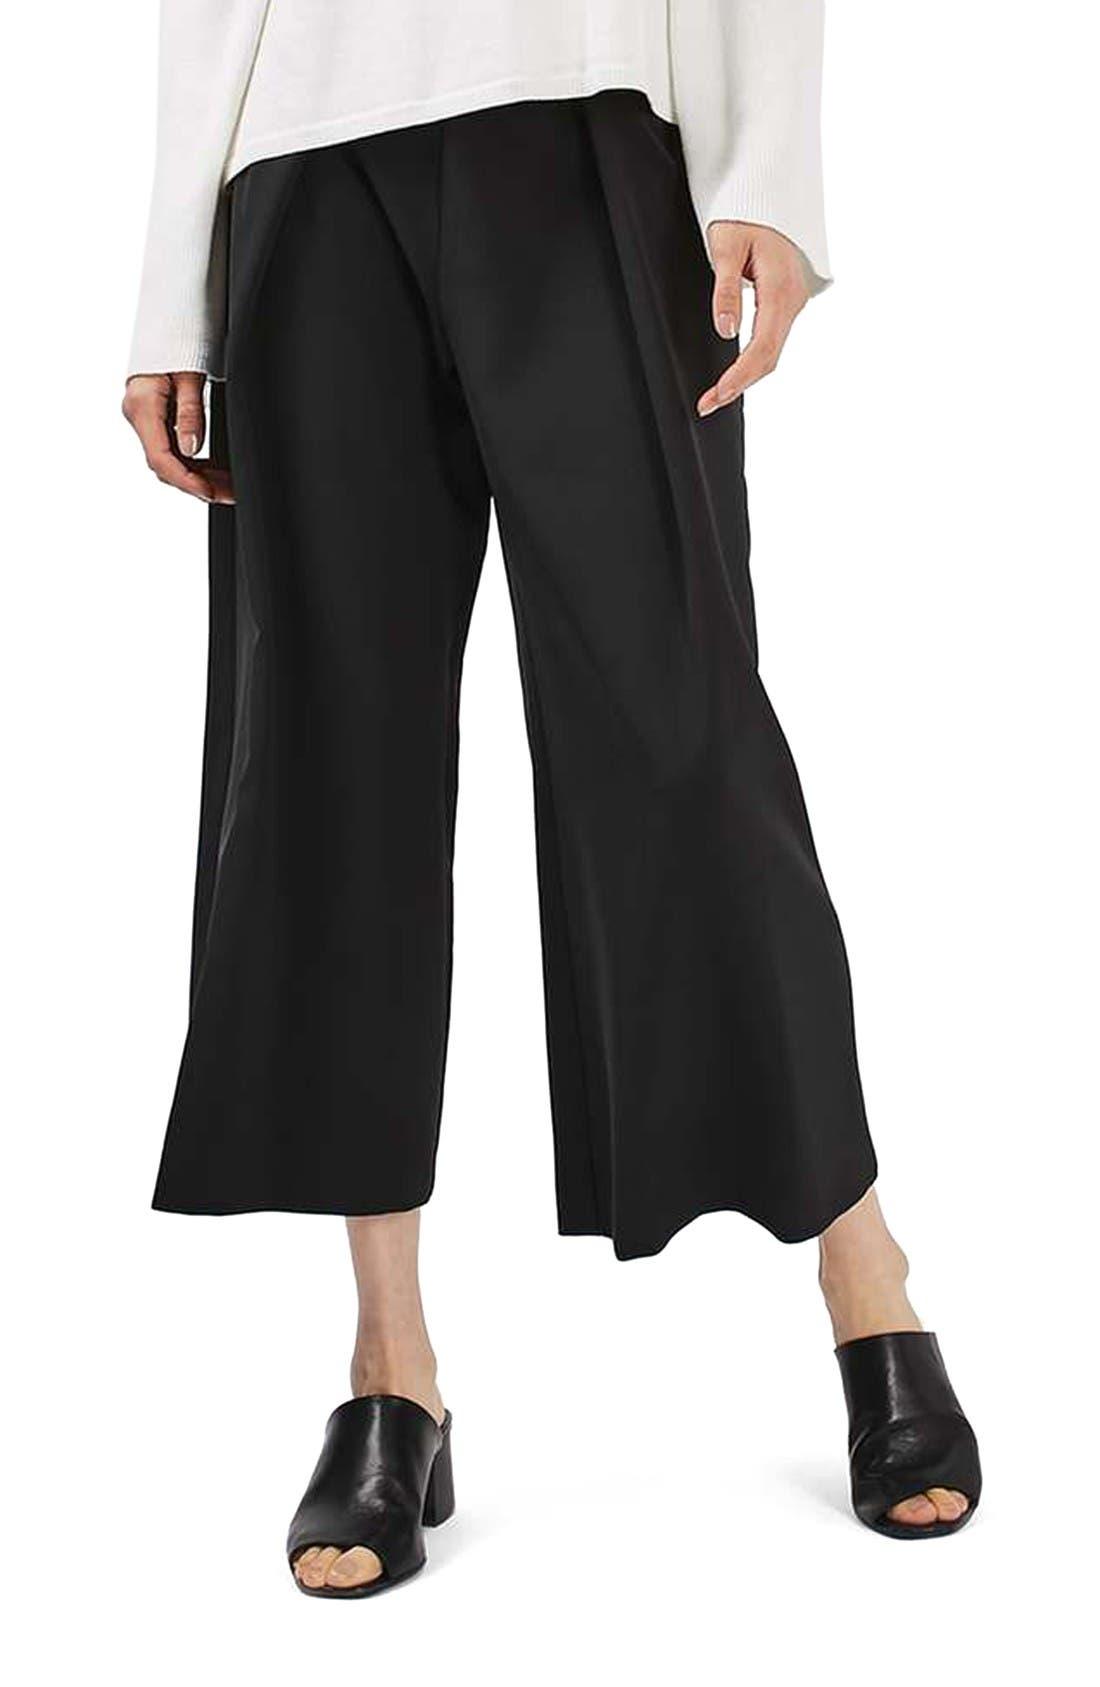 Topshop Vera Crop Wide Leg Trousers | Nordstrom